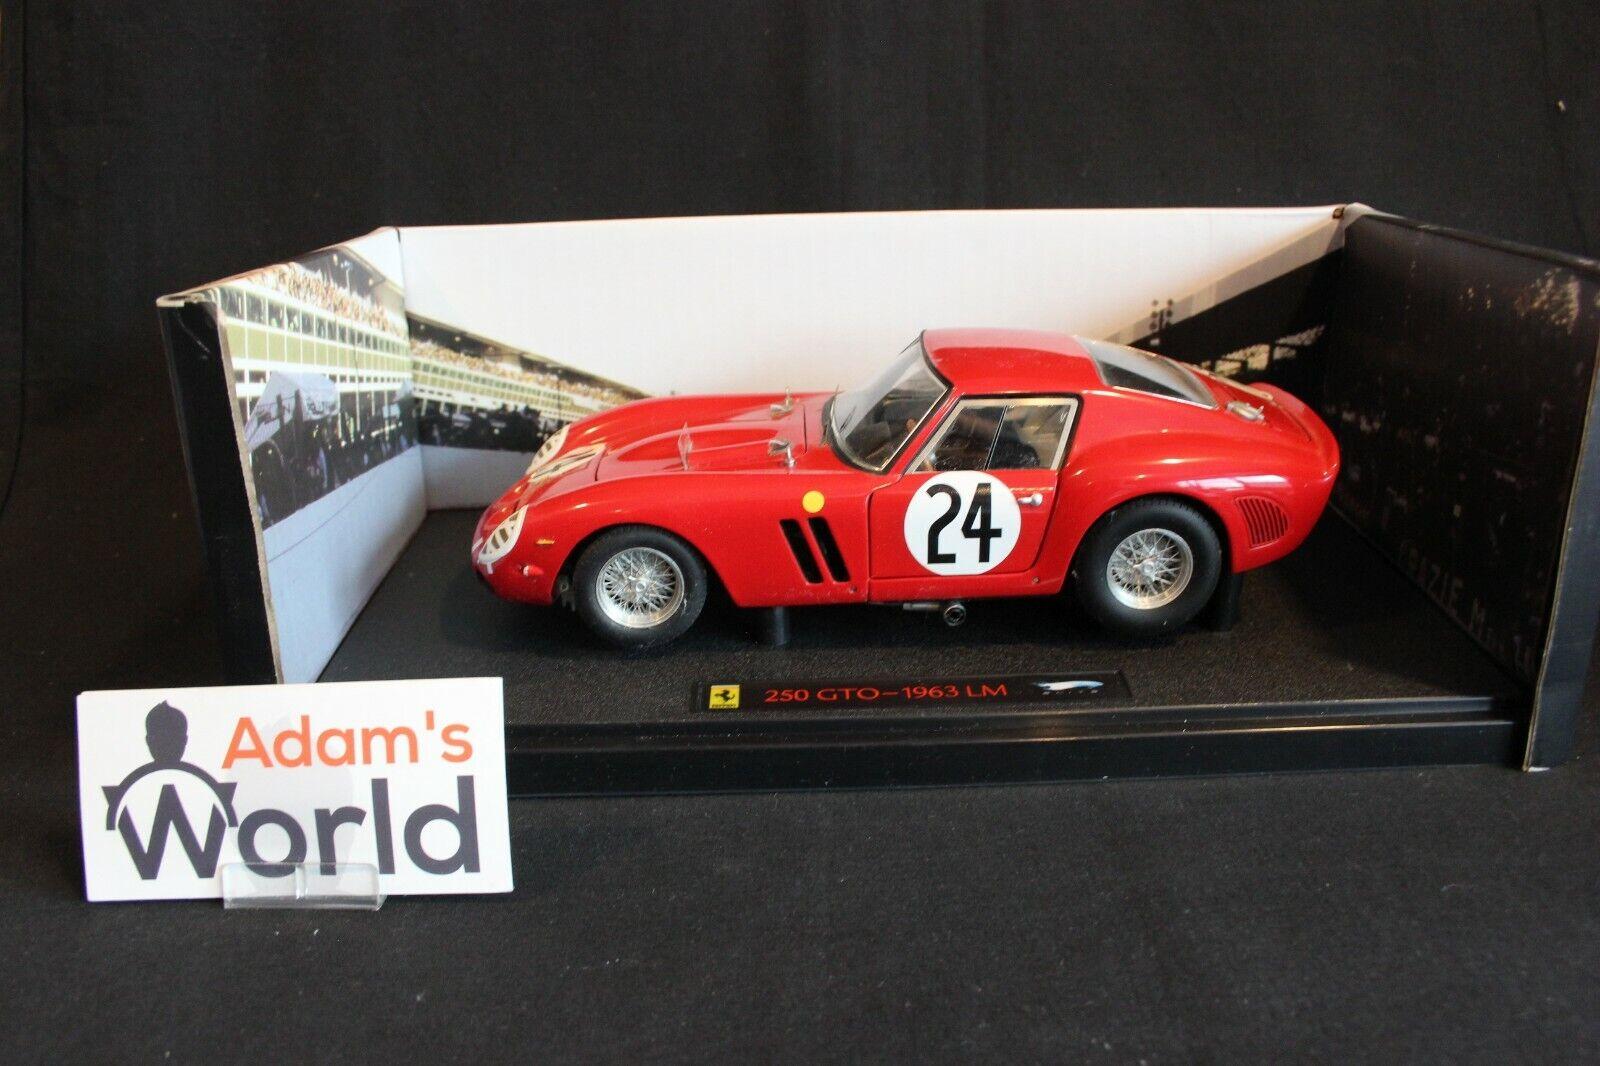 Hot Wheels Elite Ferrari 250 GTO 1963 1 18  24 Blaton   v. Ophem 24h LM (PJBB)